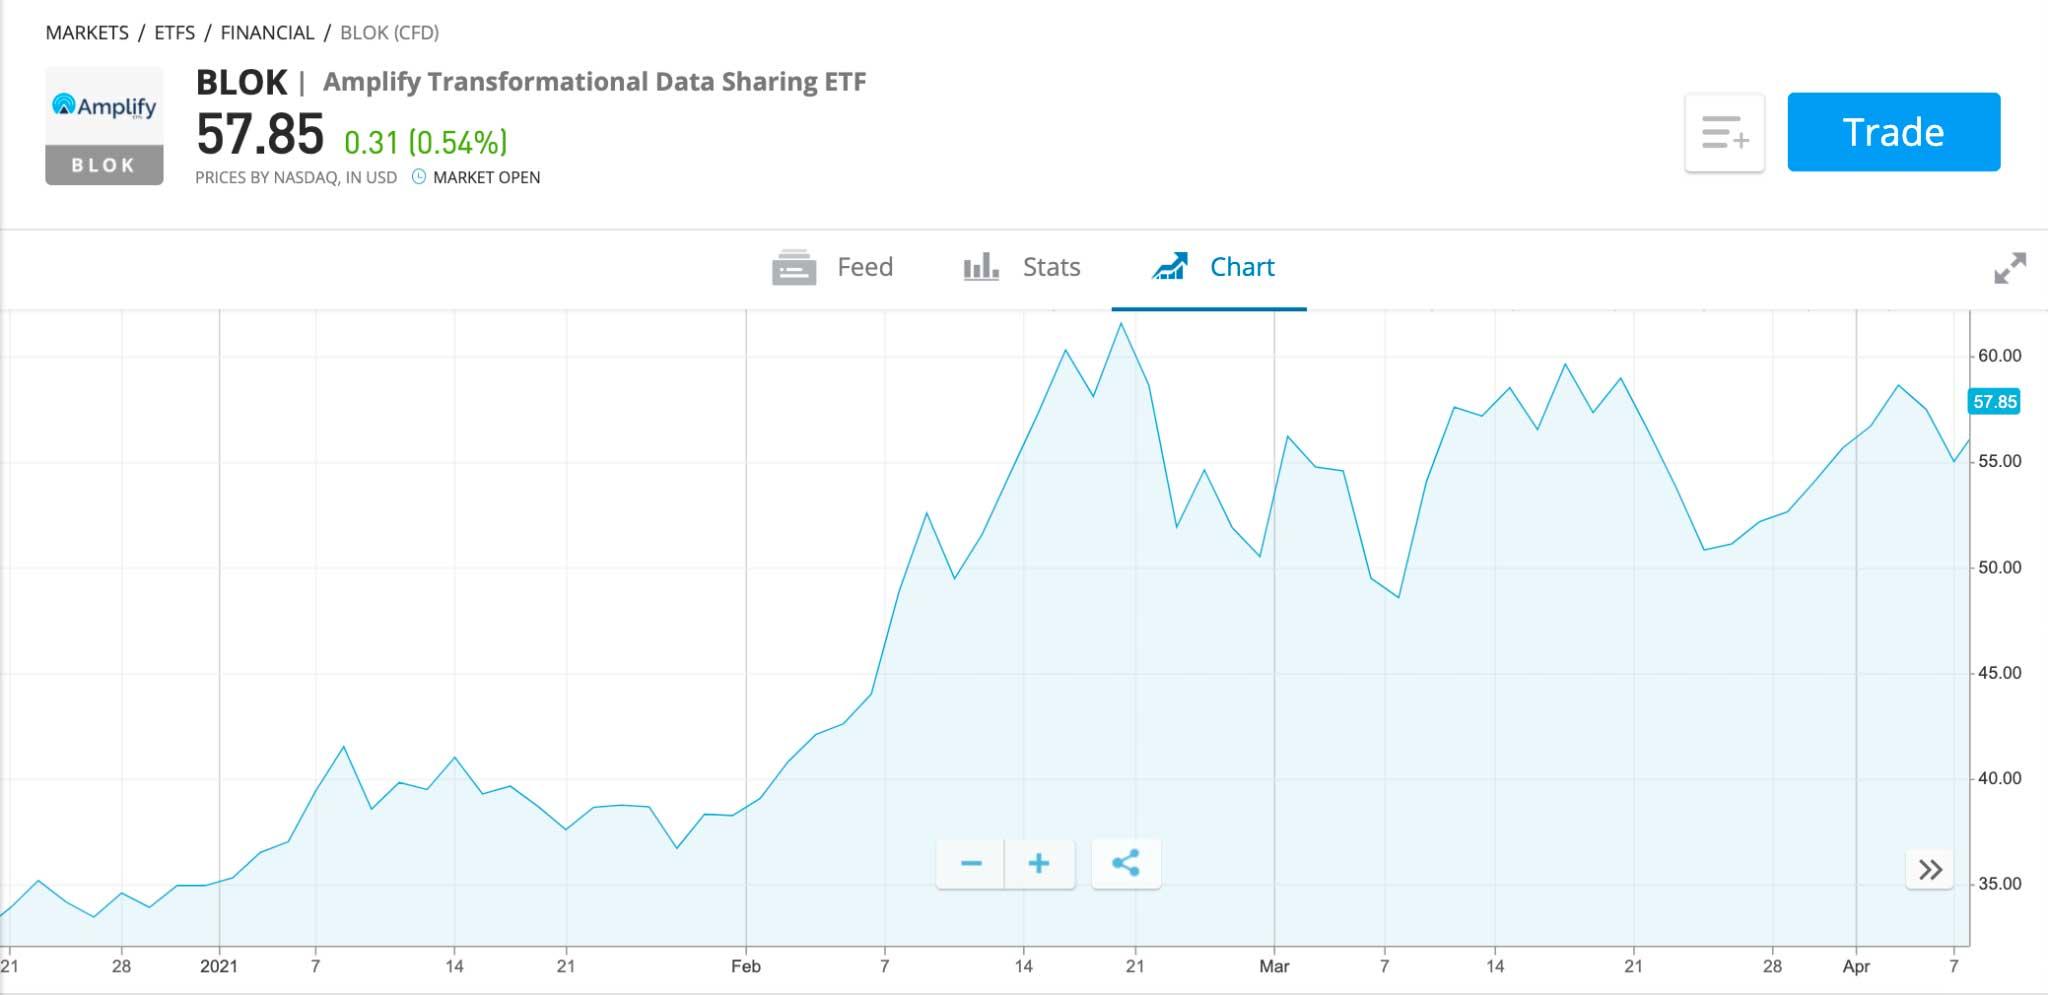 Amplify Transformational Data Sharing ETF